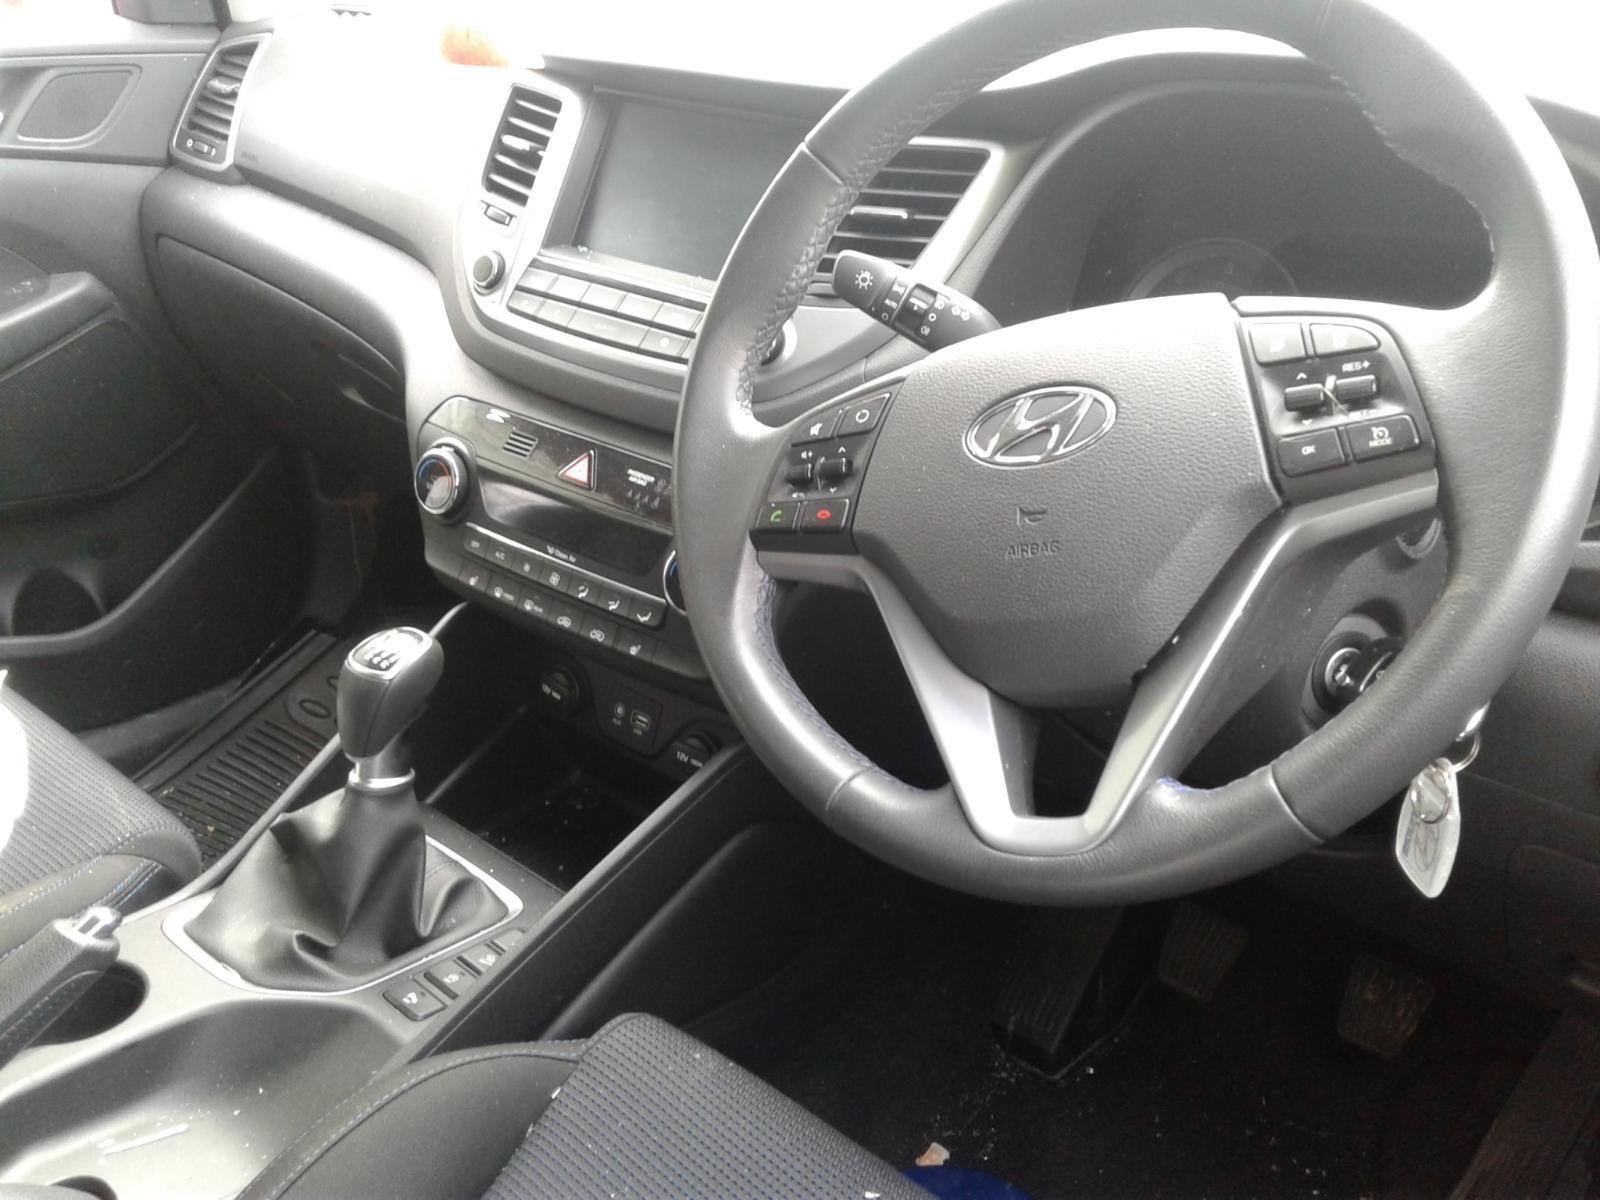 2016 Hyundai TUCSON CRDI SE NAV BLUE DRIVE Image